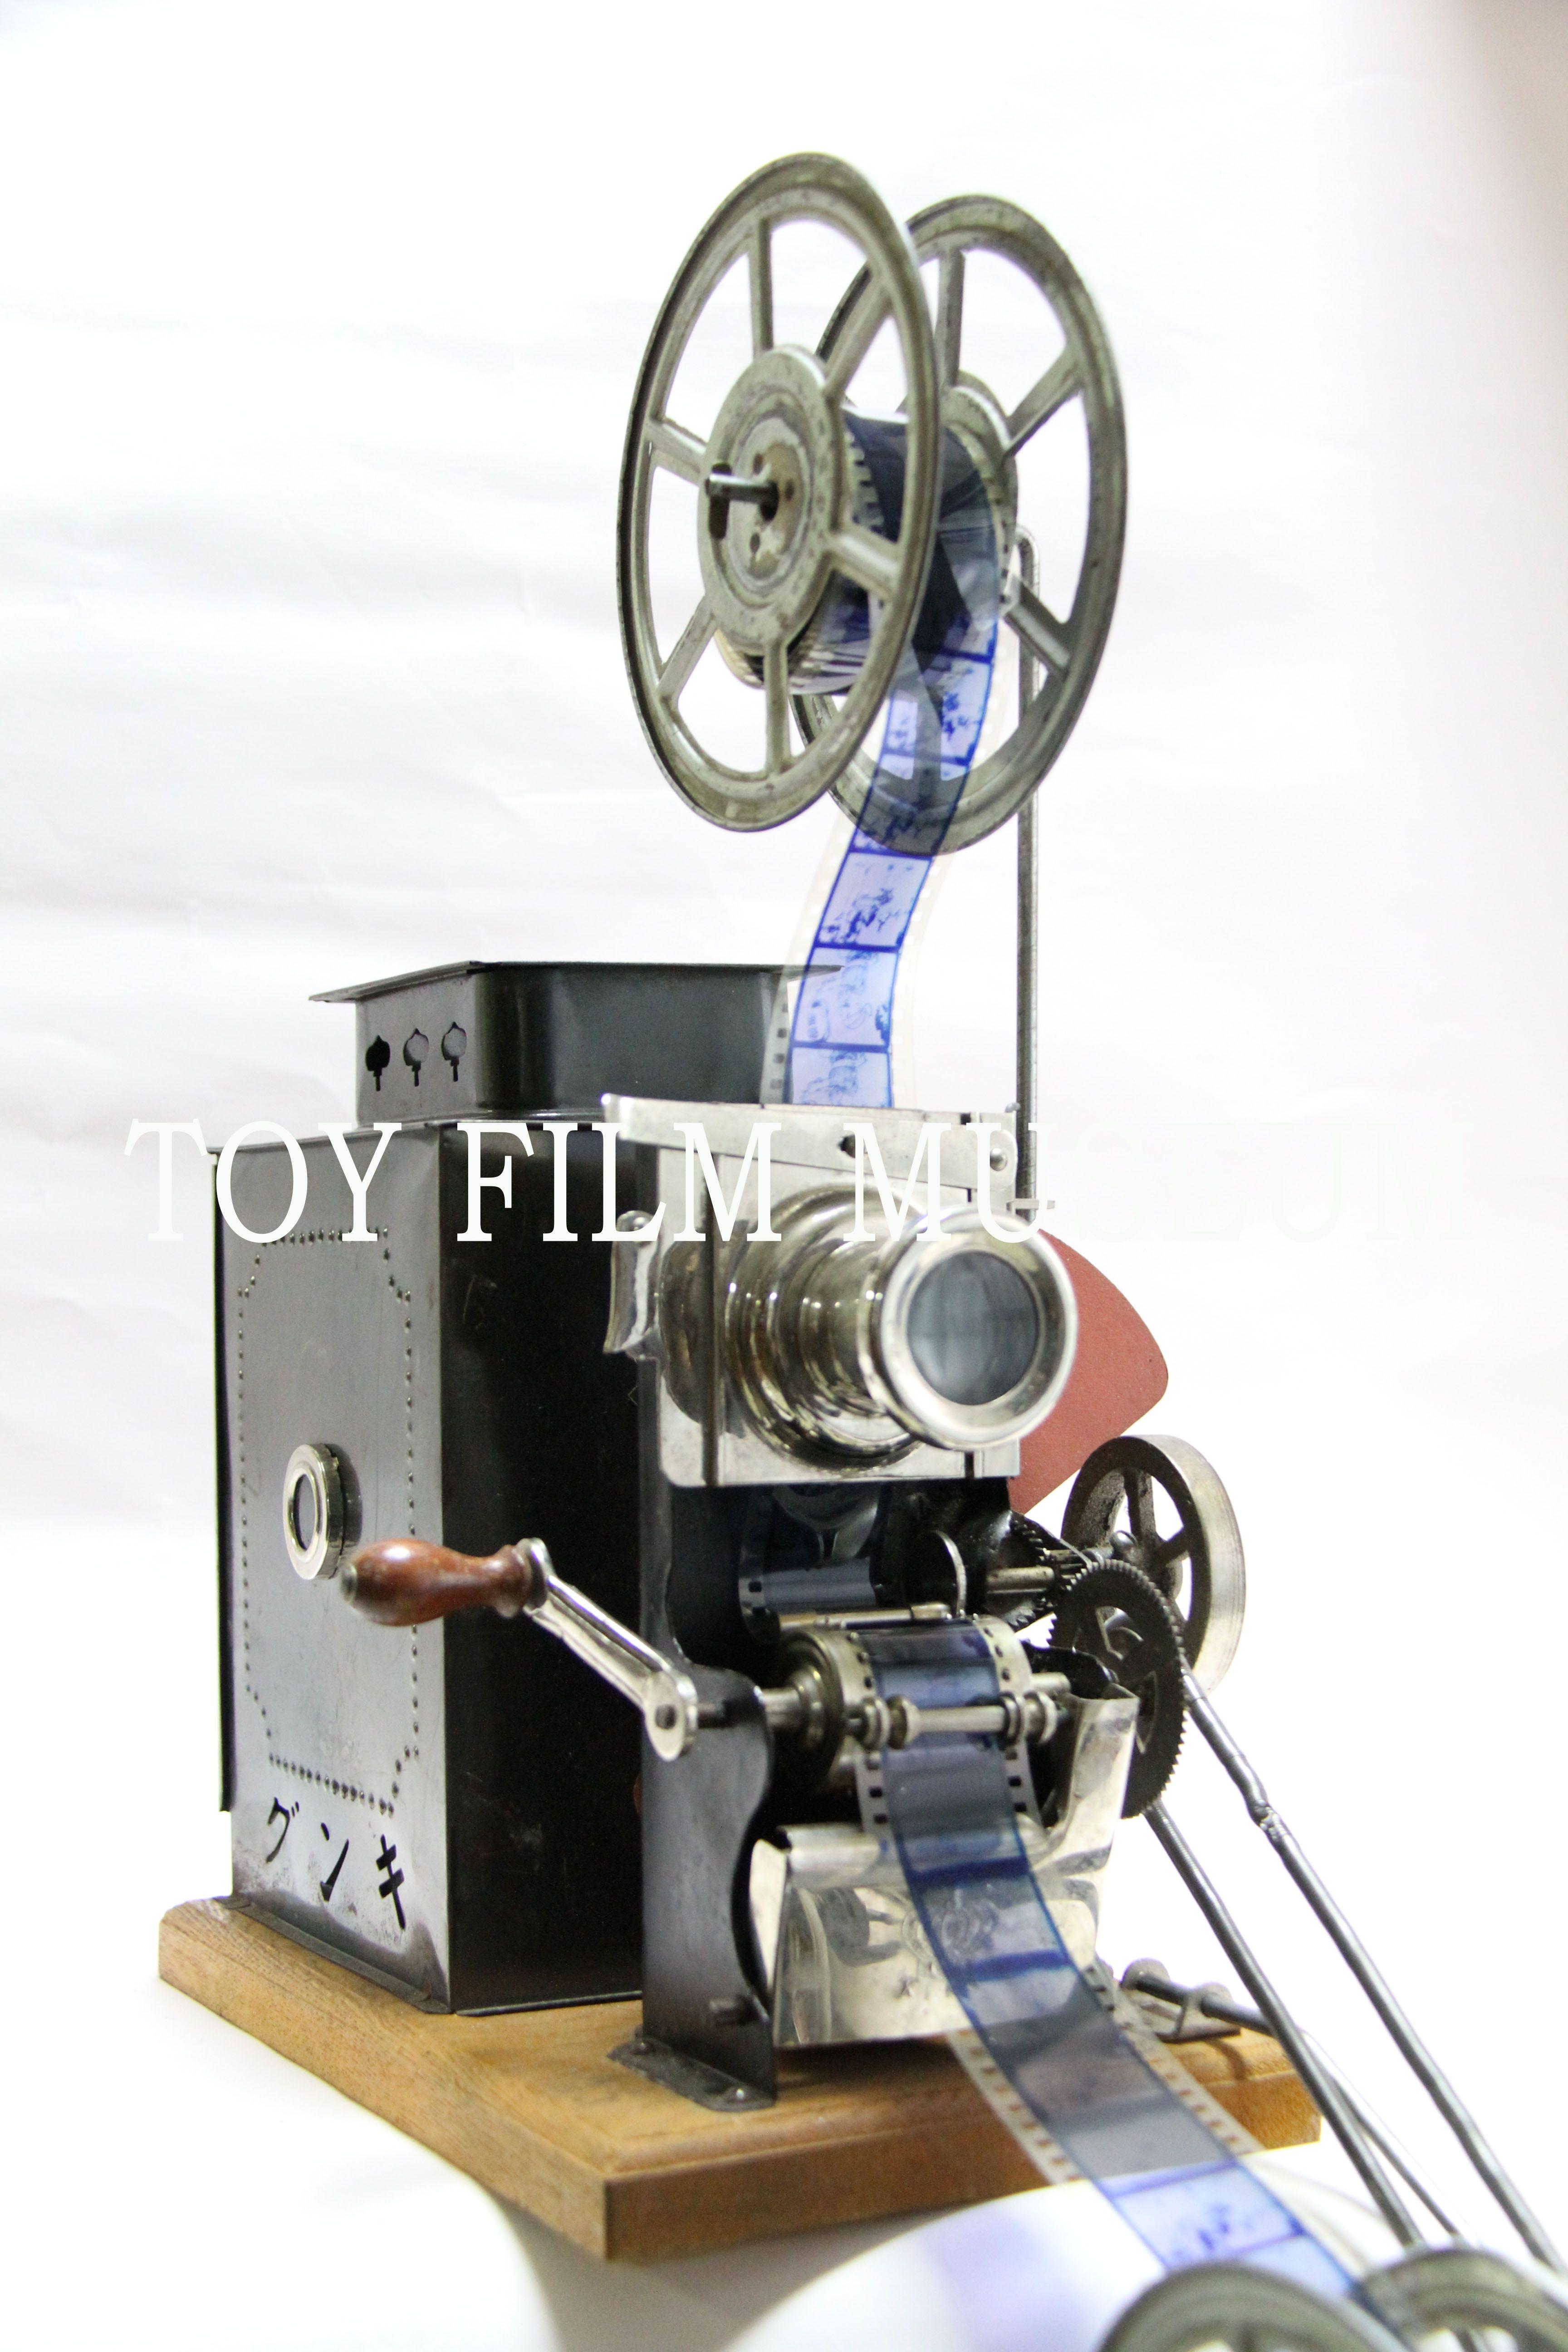 キング家庭映写機|玩具映写機 (...